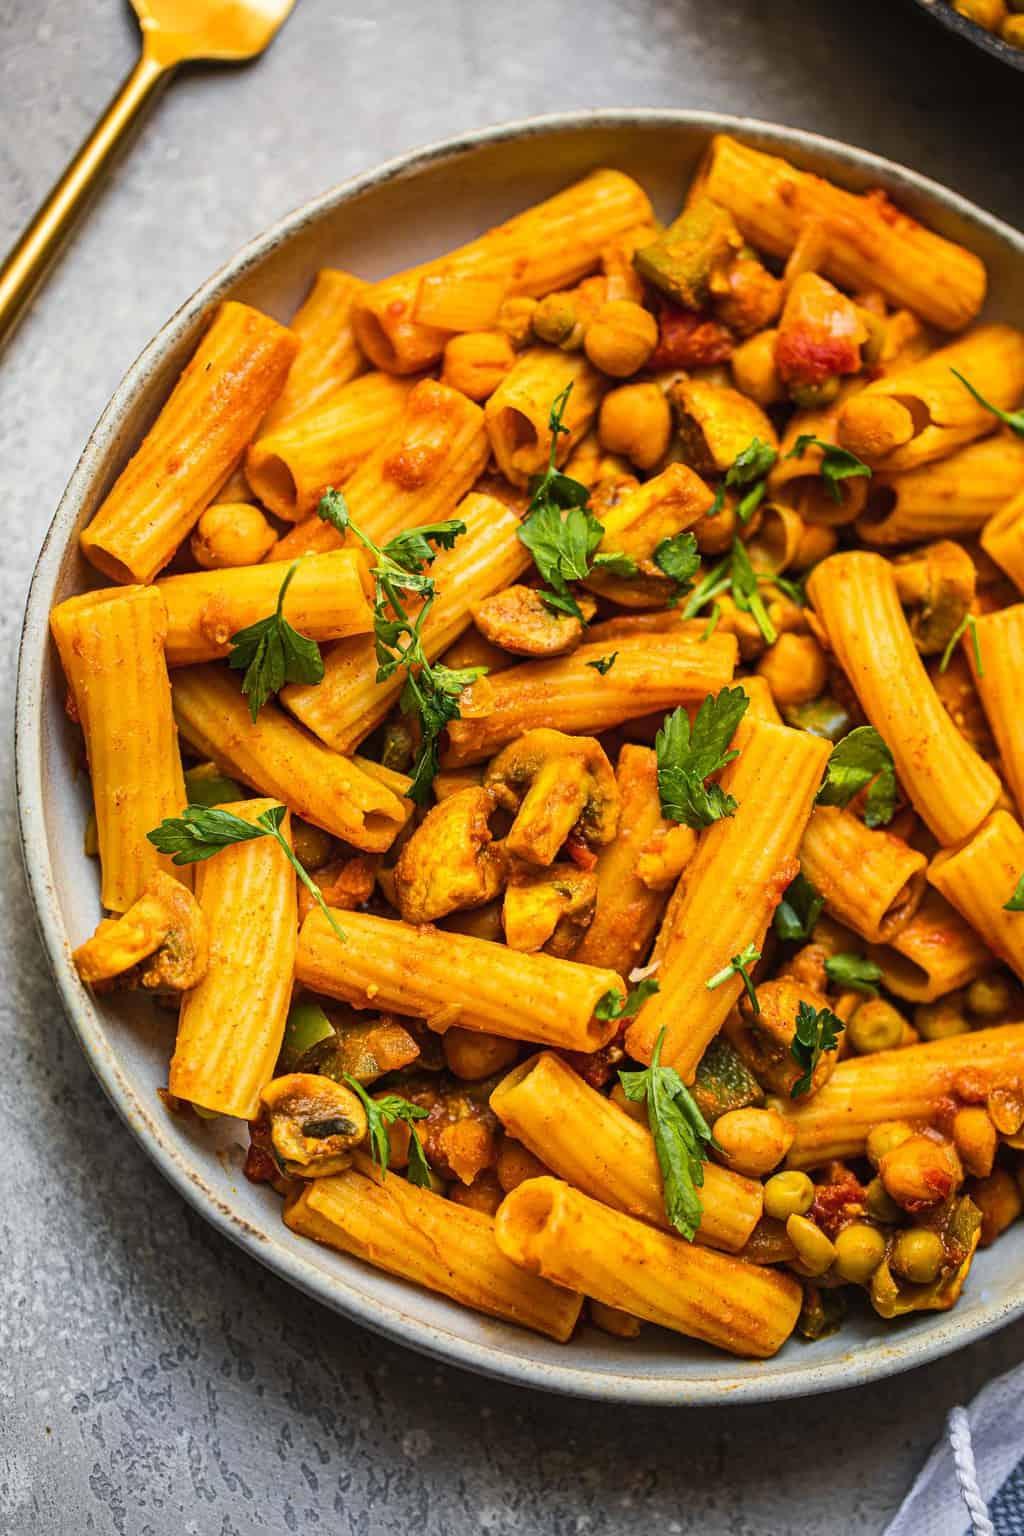 Vegan pasta with chickpeas and mushrooms